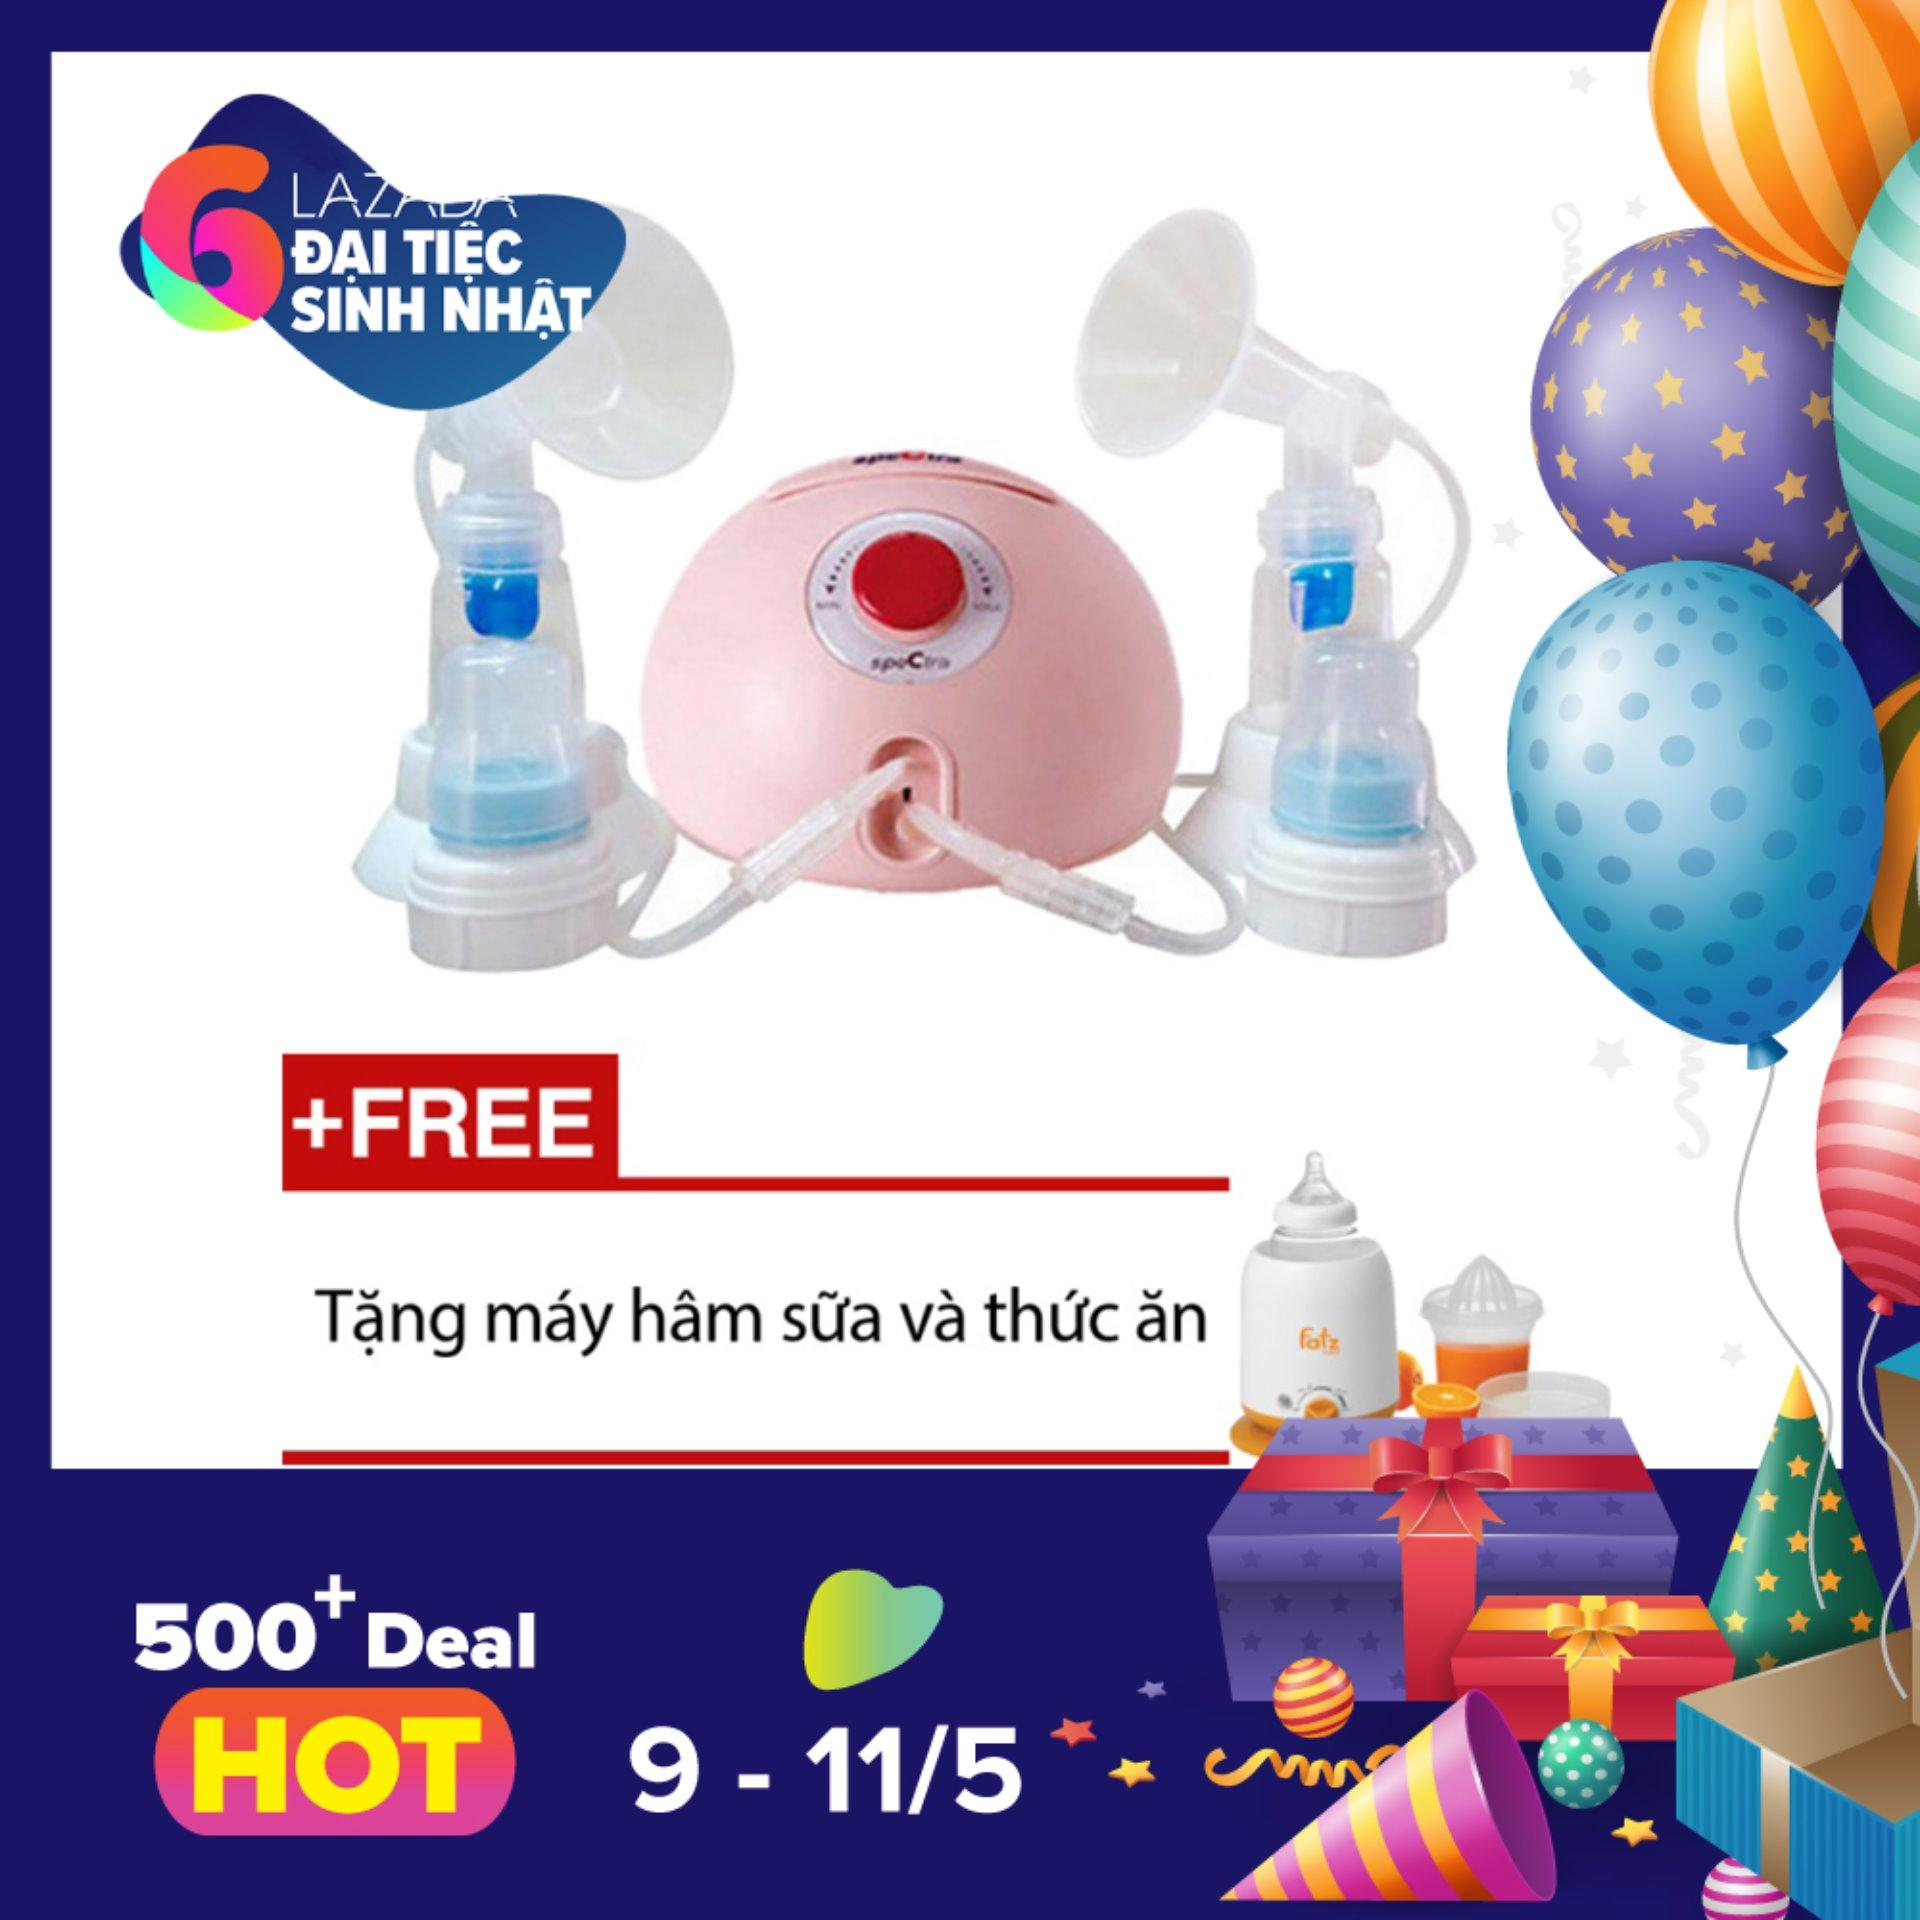 Giá Bán May Hut Sữa Spectra Dew 350 Hồng Tặng 1 May Ham Sữa Va Thức Ăn Fatz Baby Fb3002Sl Rẻ Nhất